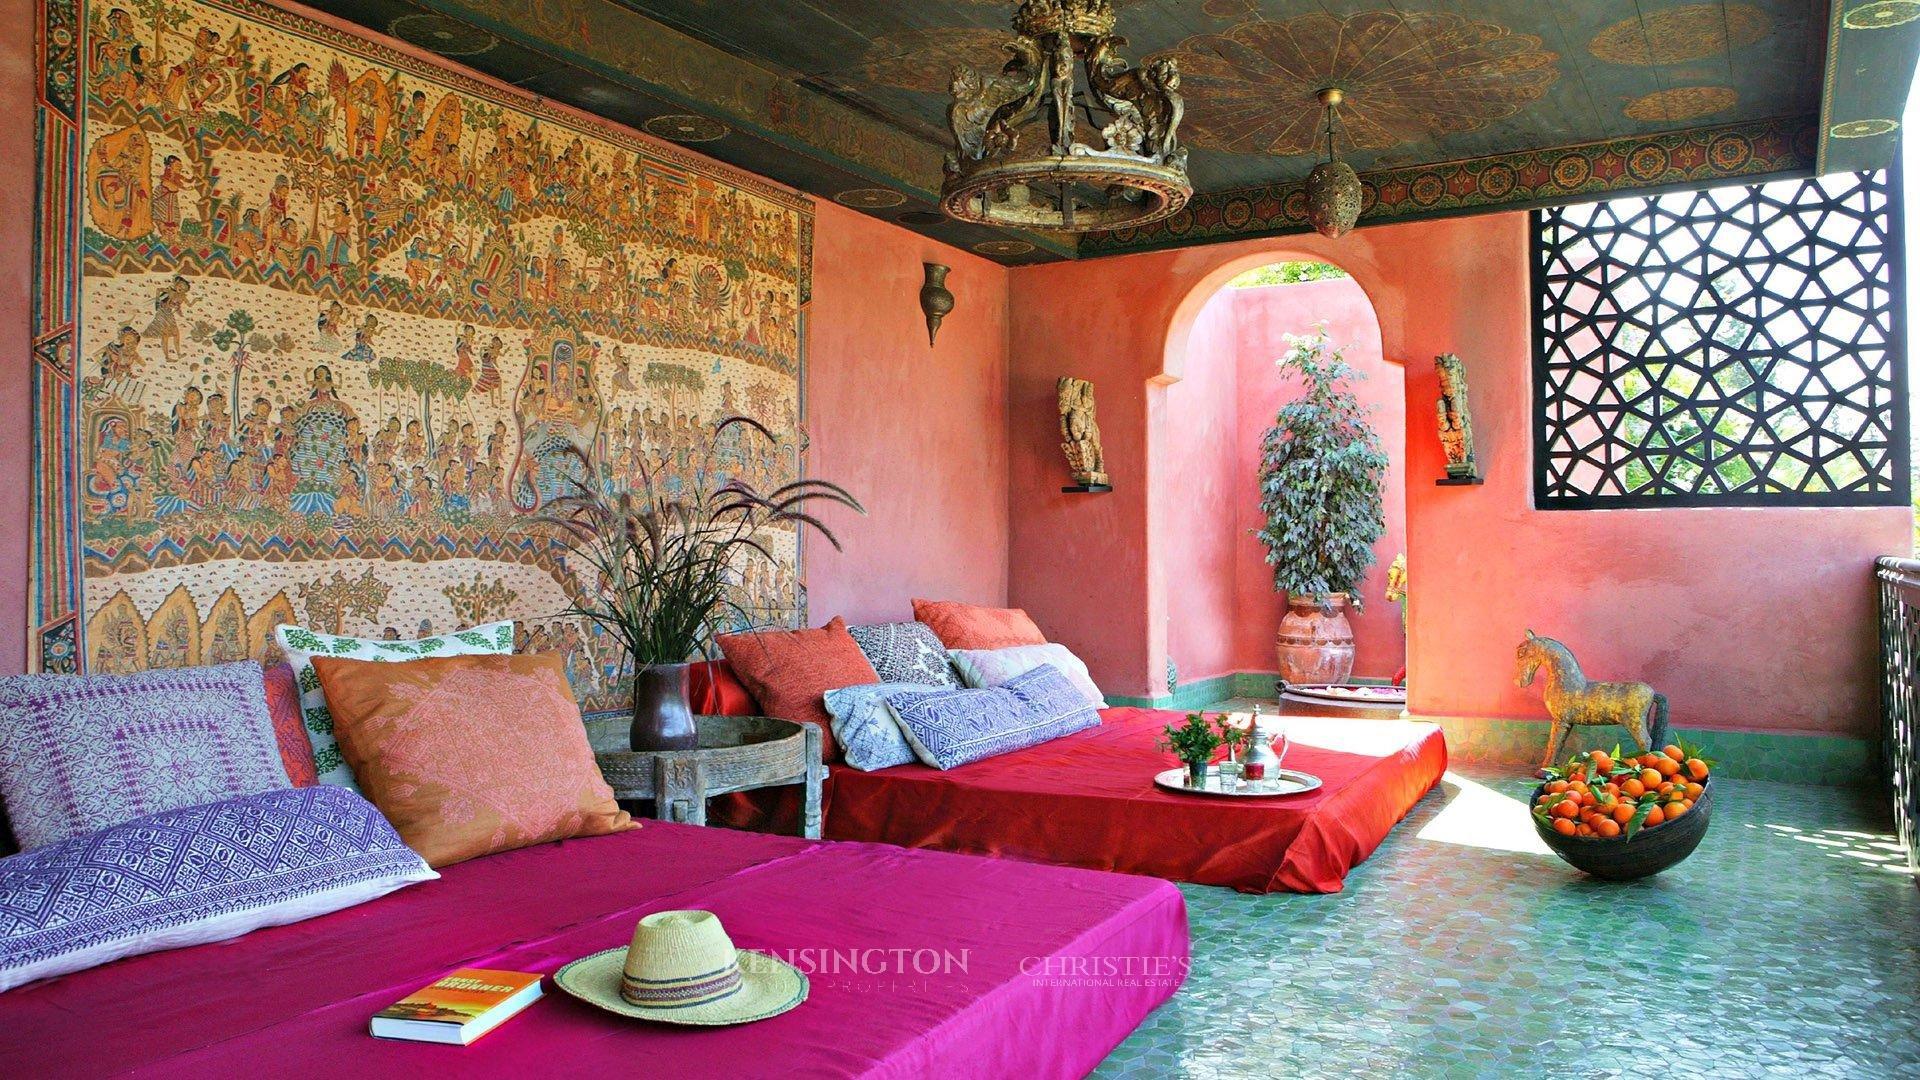 KPPM00668: Nordic Villa Luxury Villa Marrakech Morocco